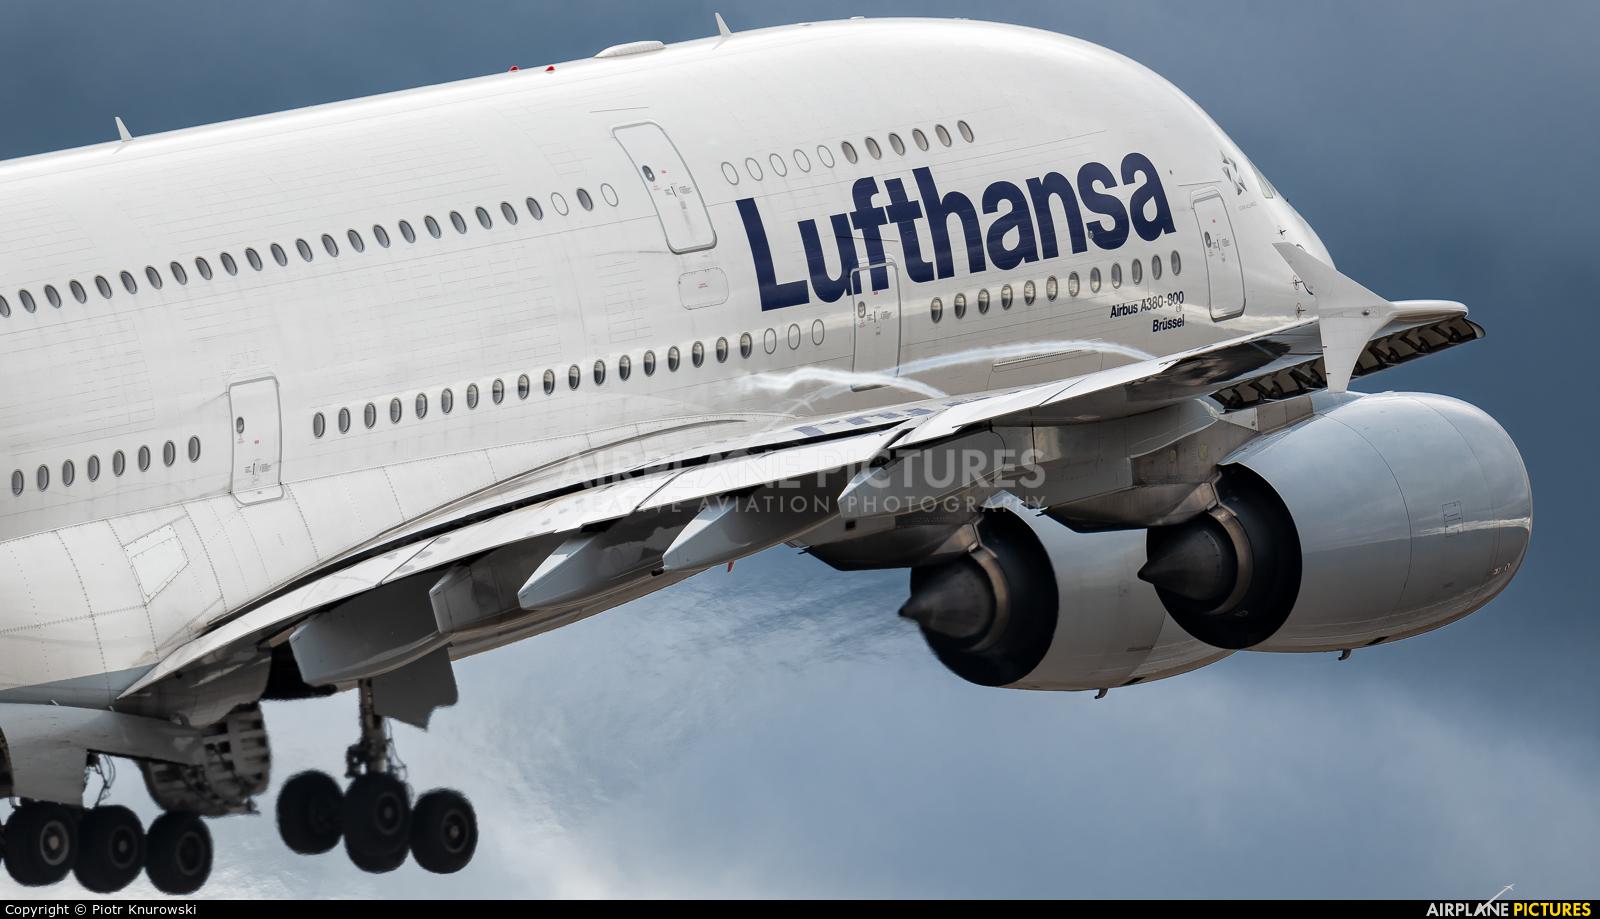 Lufthansa D-AIMJ aircraft at Frankfurt